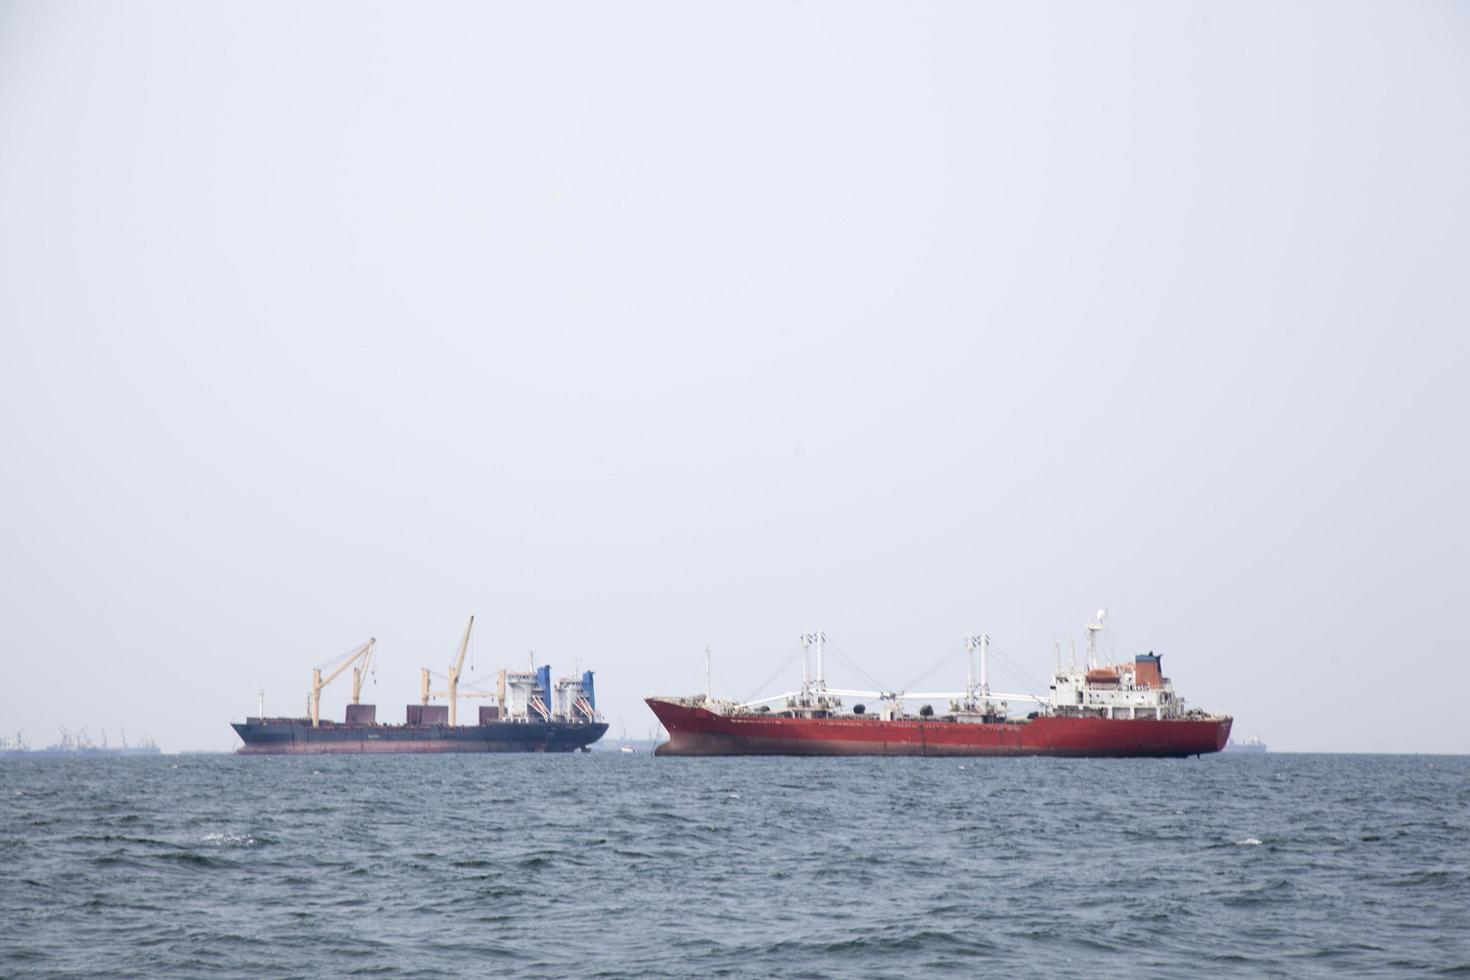 große Frachtschiffe auf dem Meer foto